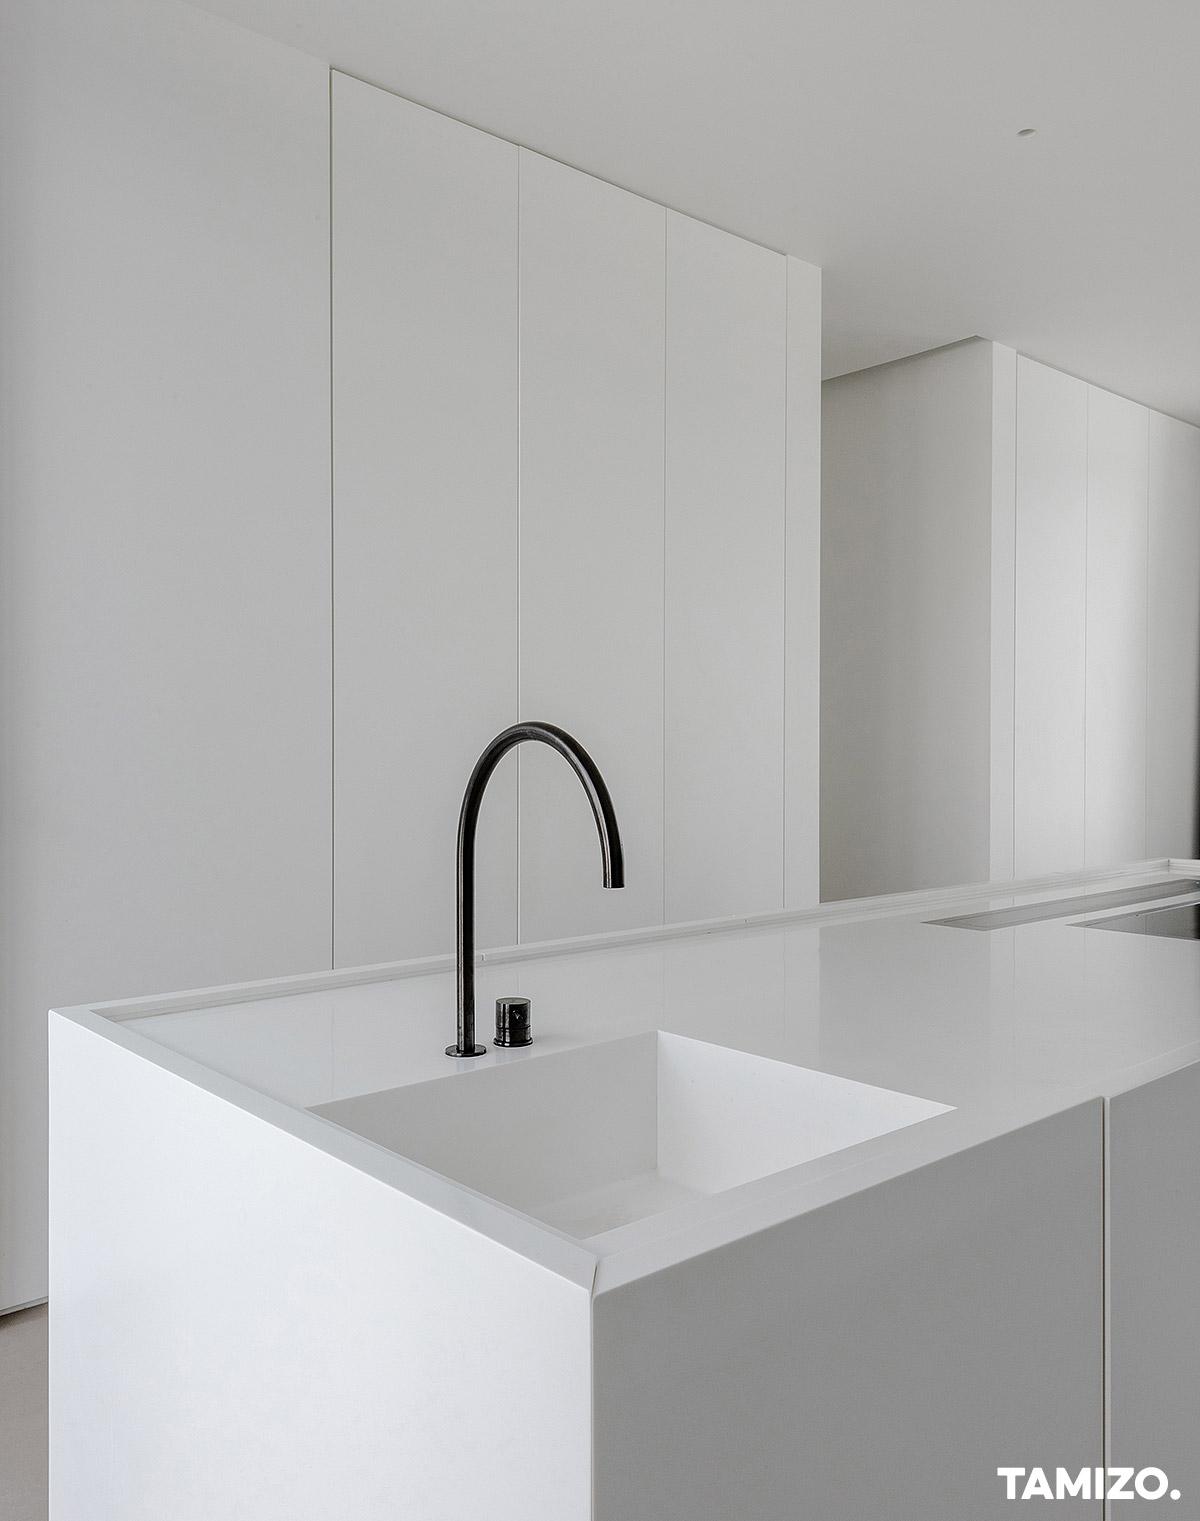 025_tamizo_architects_interior_house_realization_warsaw_poland_36